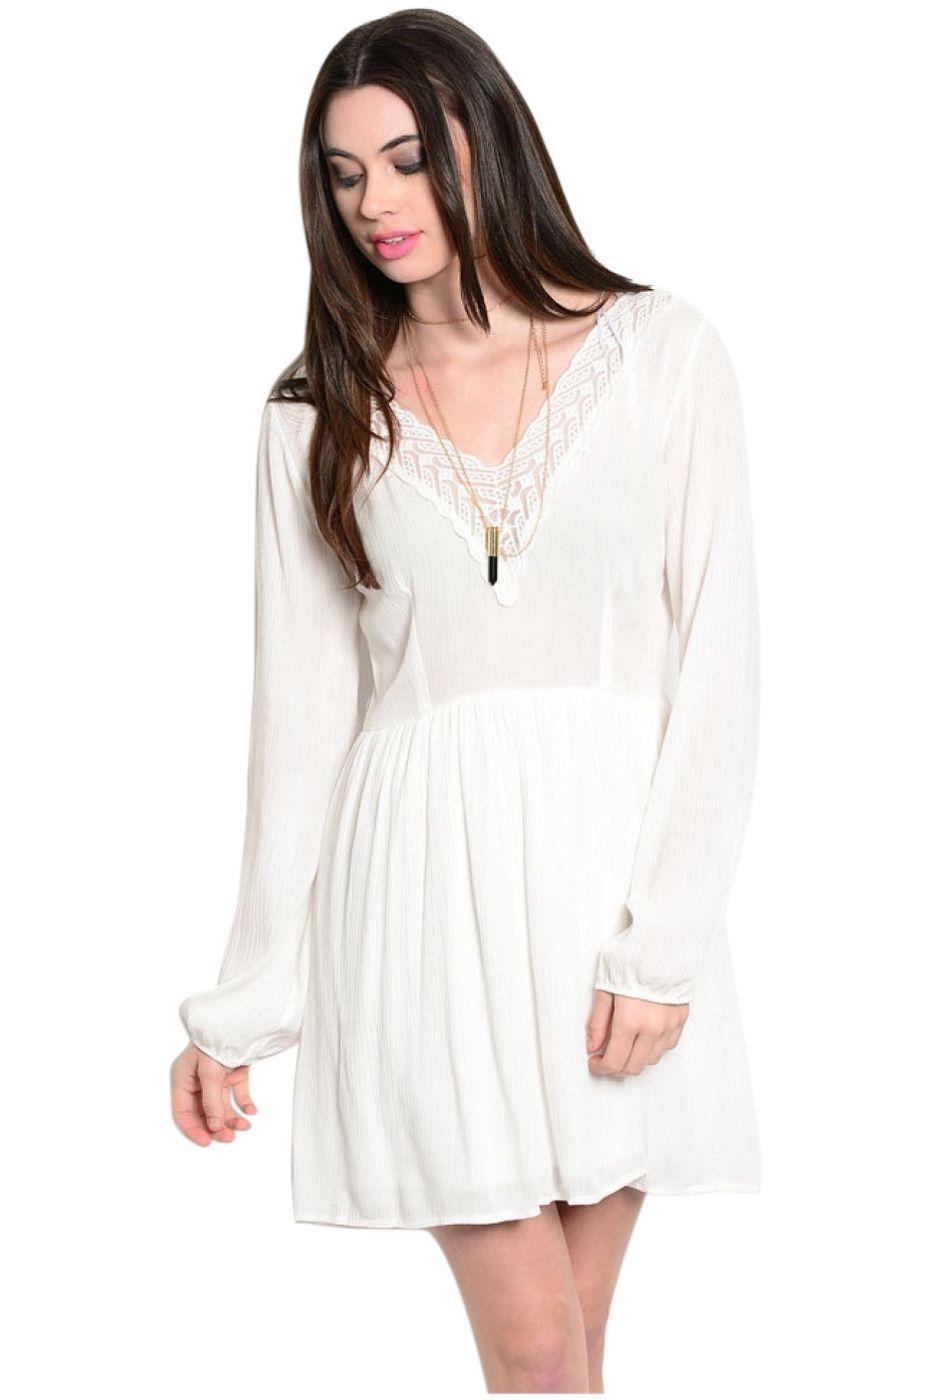 Long Sleeve Lace Trimmed Boho Peasant Dress Peasant Dress Boho Long Sleeve Boho Dress Fit Flare Dress [ 1400 x 932 Pixel ]